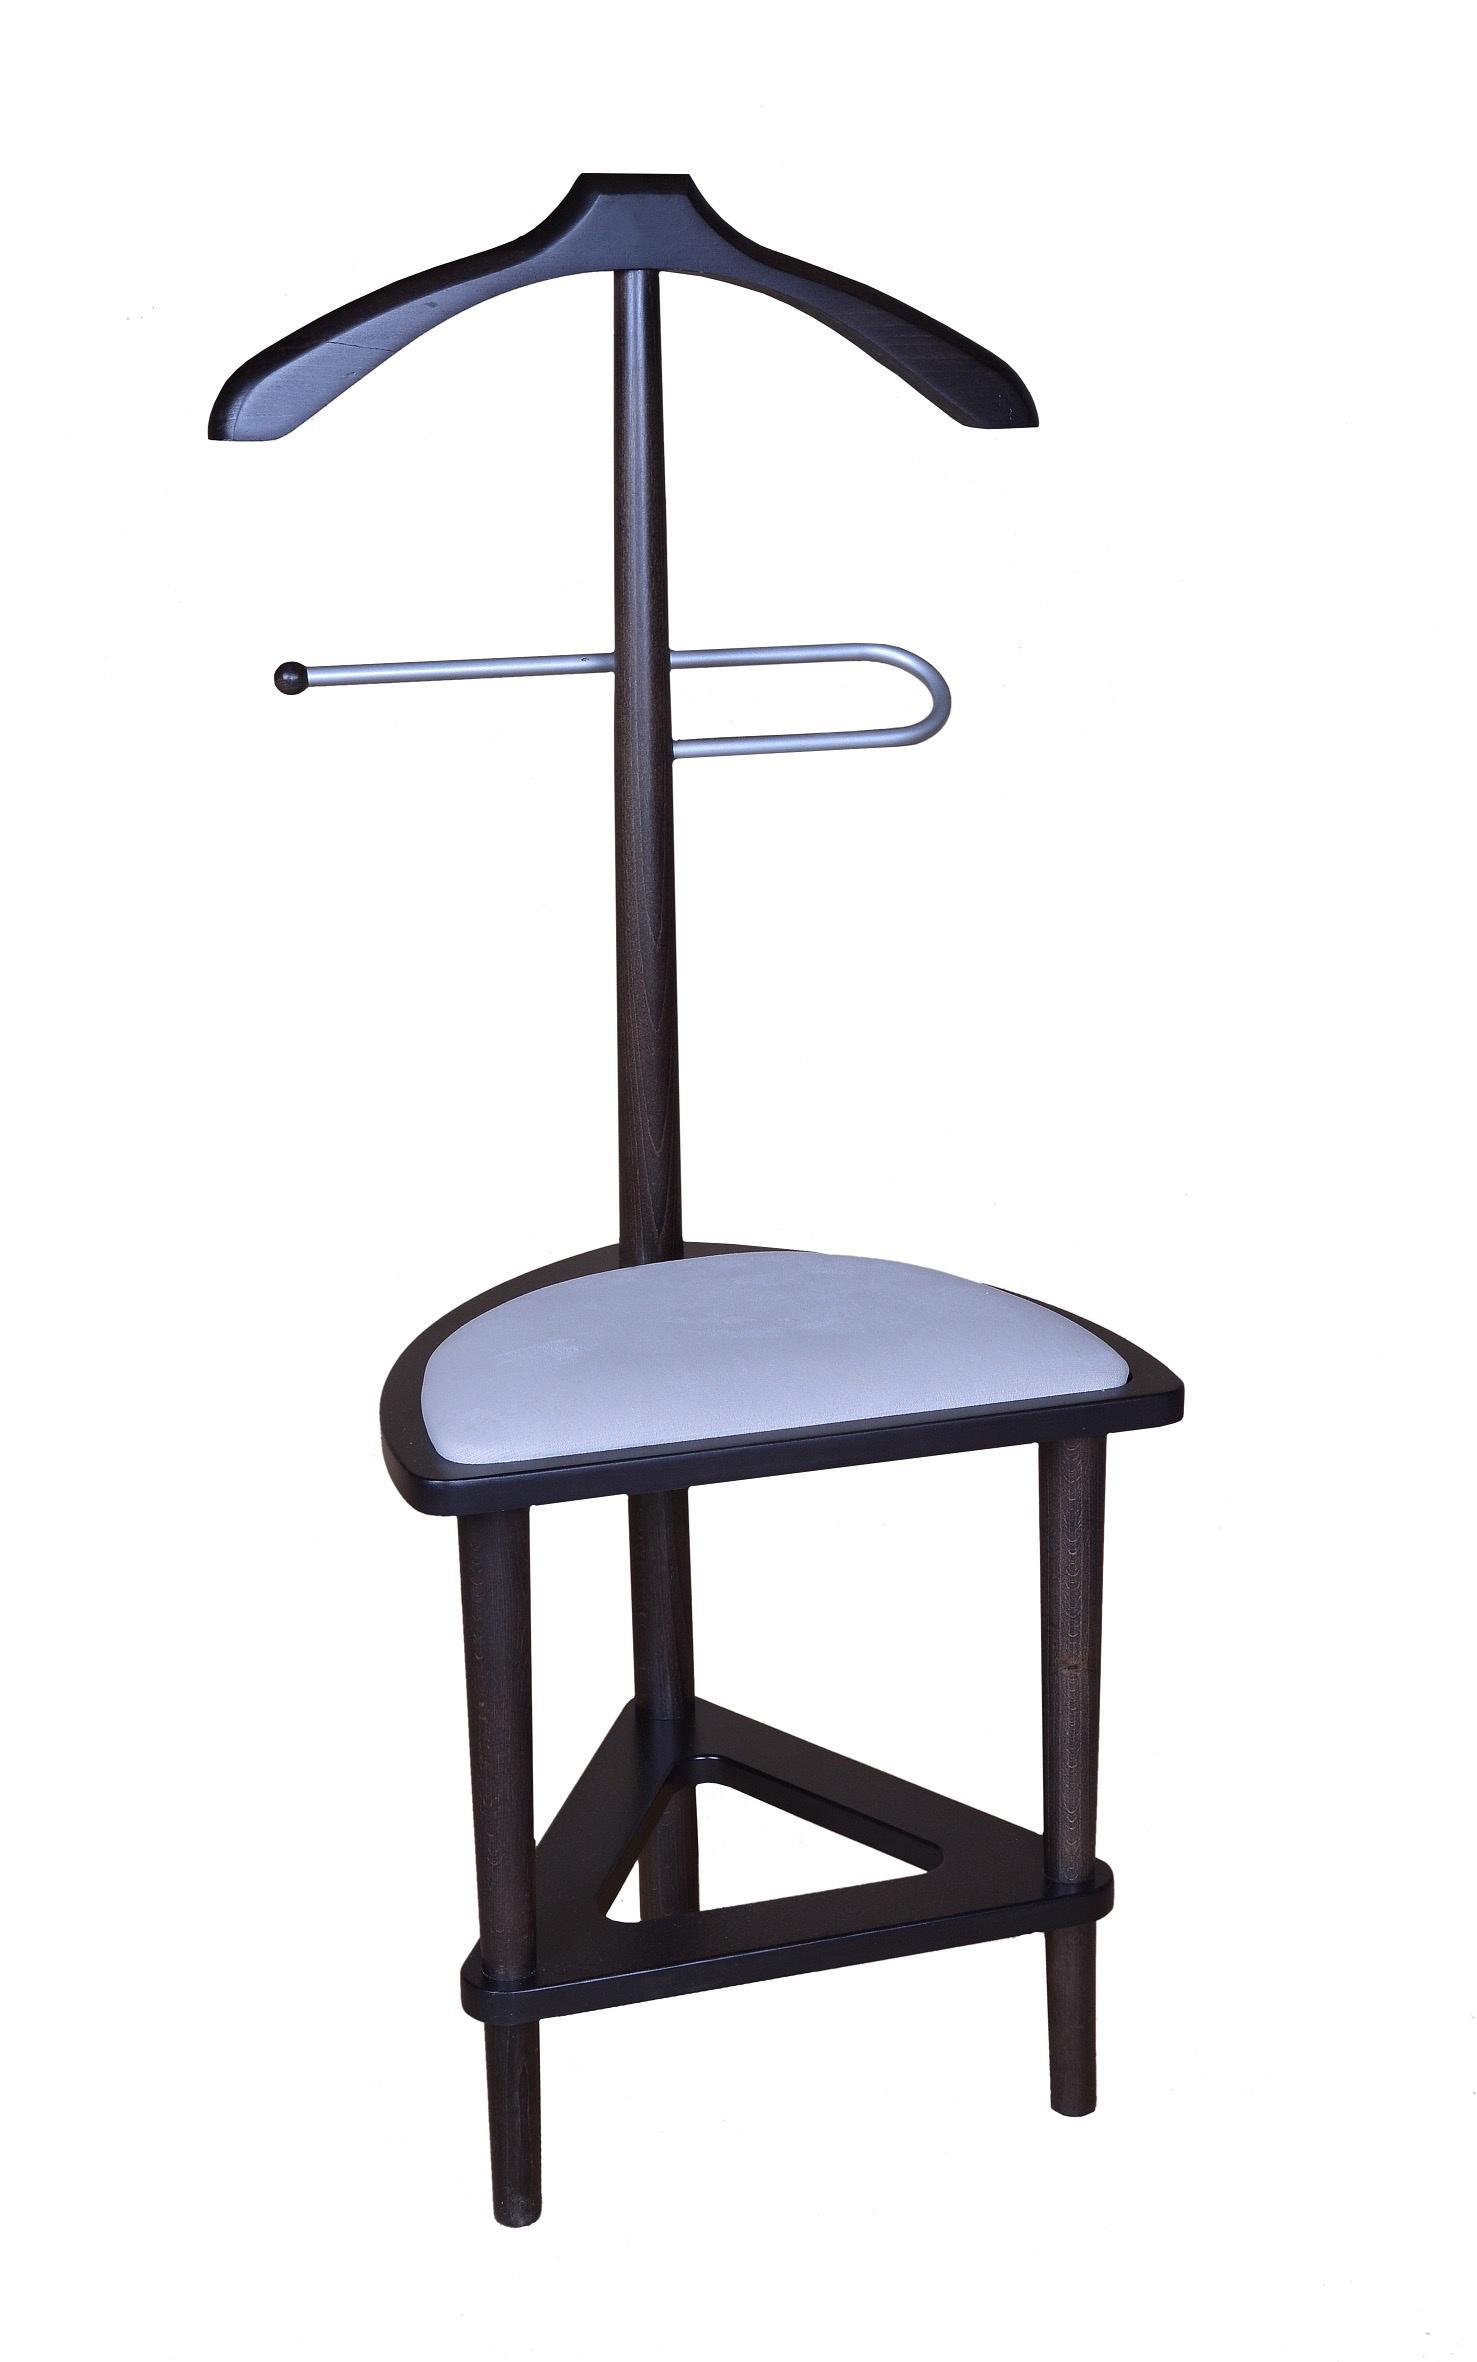 Вешалка напольная Прайм Модель 4, темно-коричневыйМ4.1000вешалка-стул